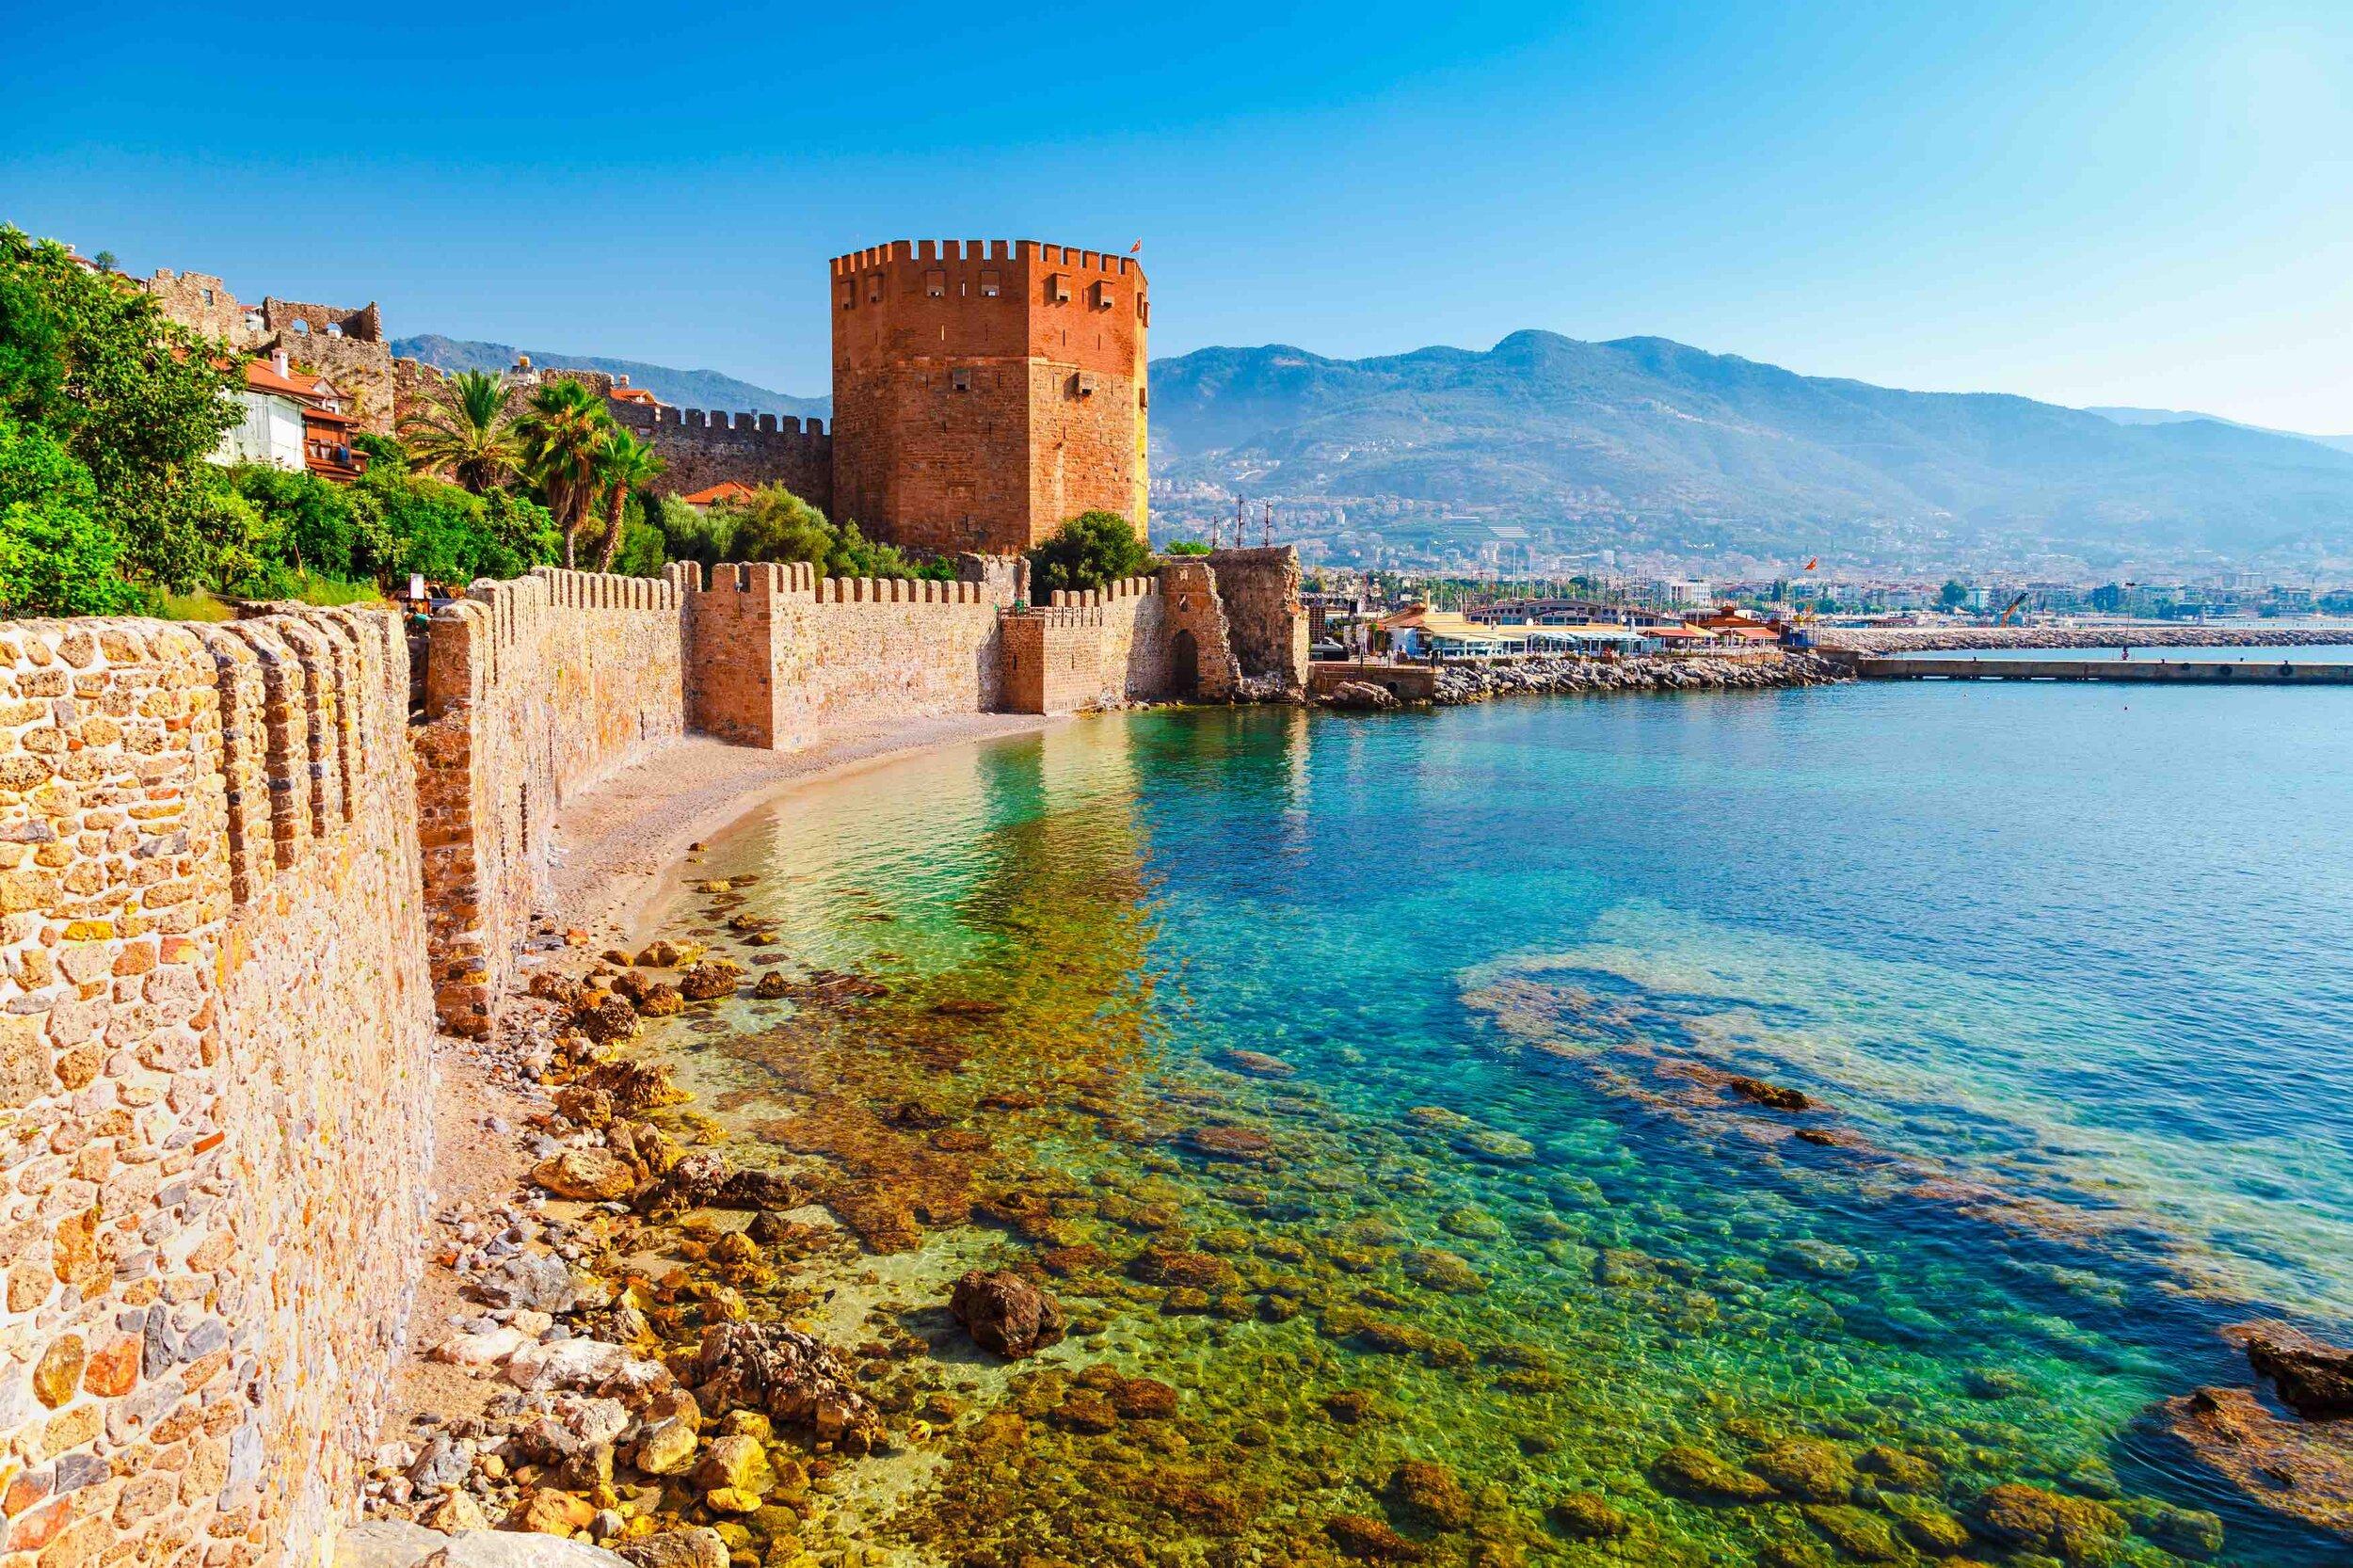 iStock-821804760 Turkey ancient castle.jpg